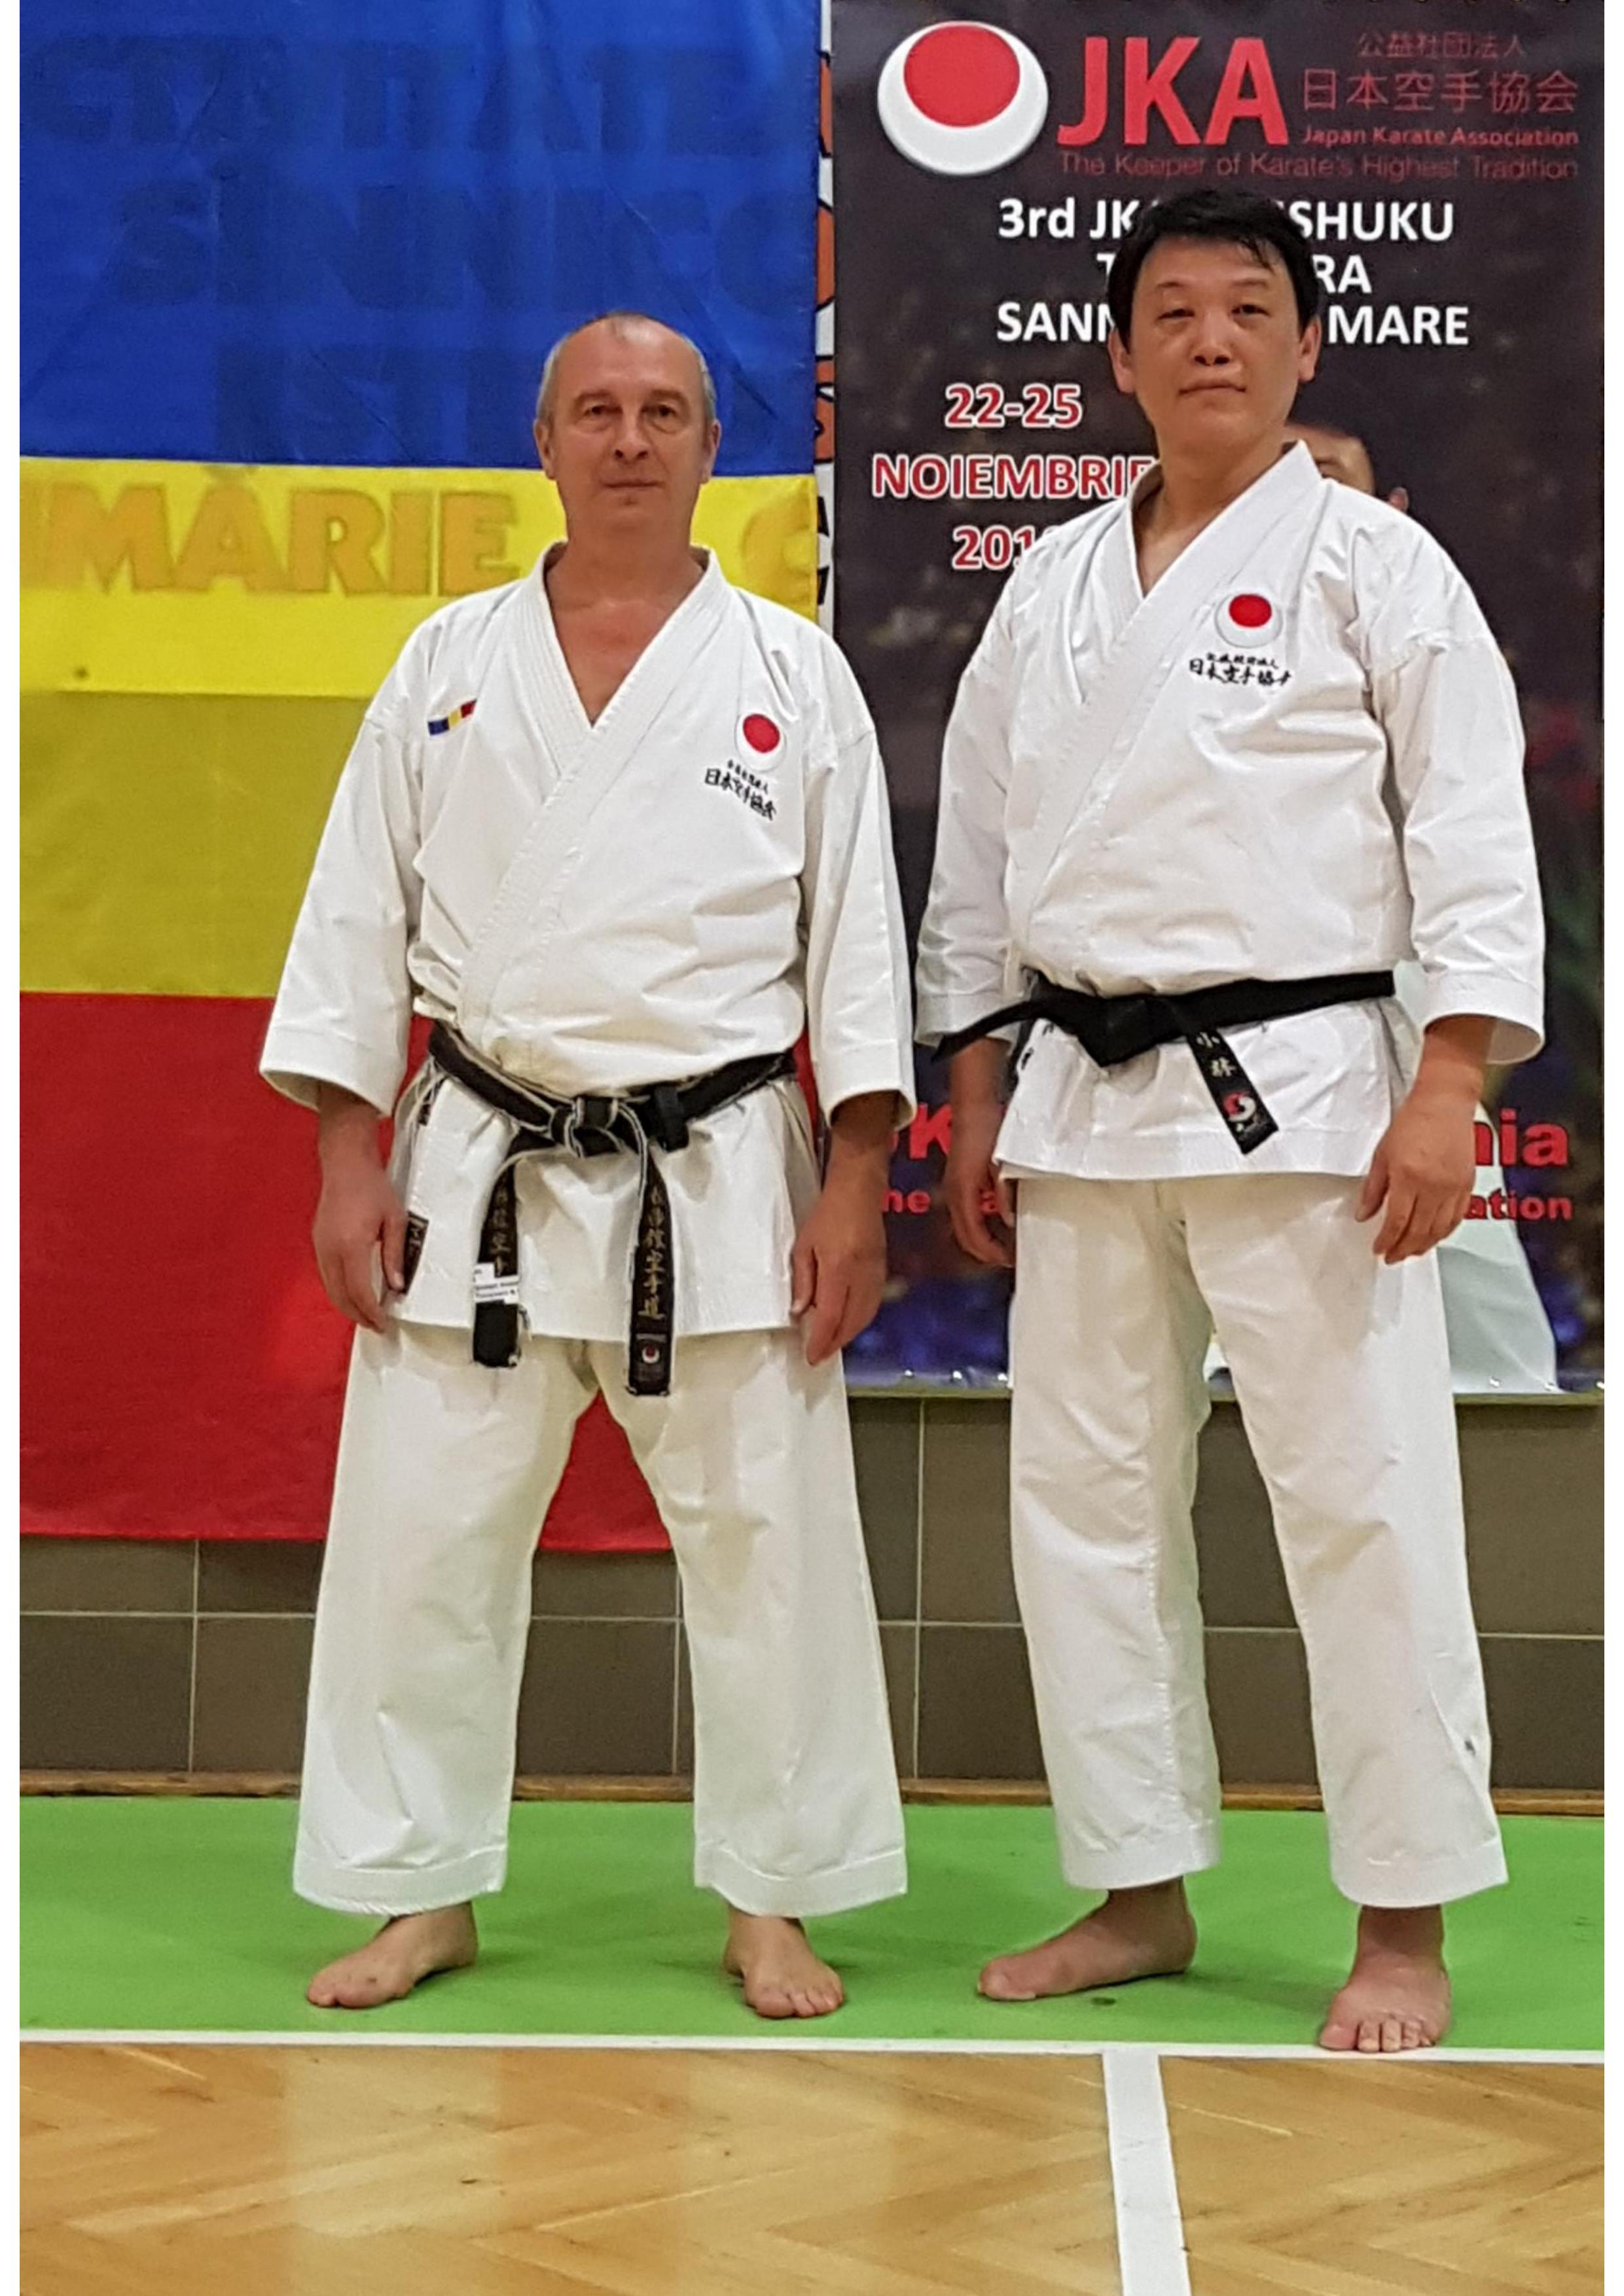 JKA Gasshuku Kunio Kobayashi Sensei 7 dan JKA-22-25 Noiembrie 2018-Timisoara&Sannicolau Mare